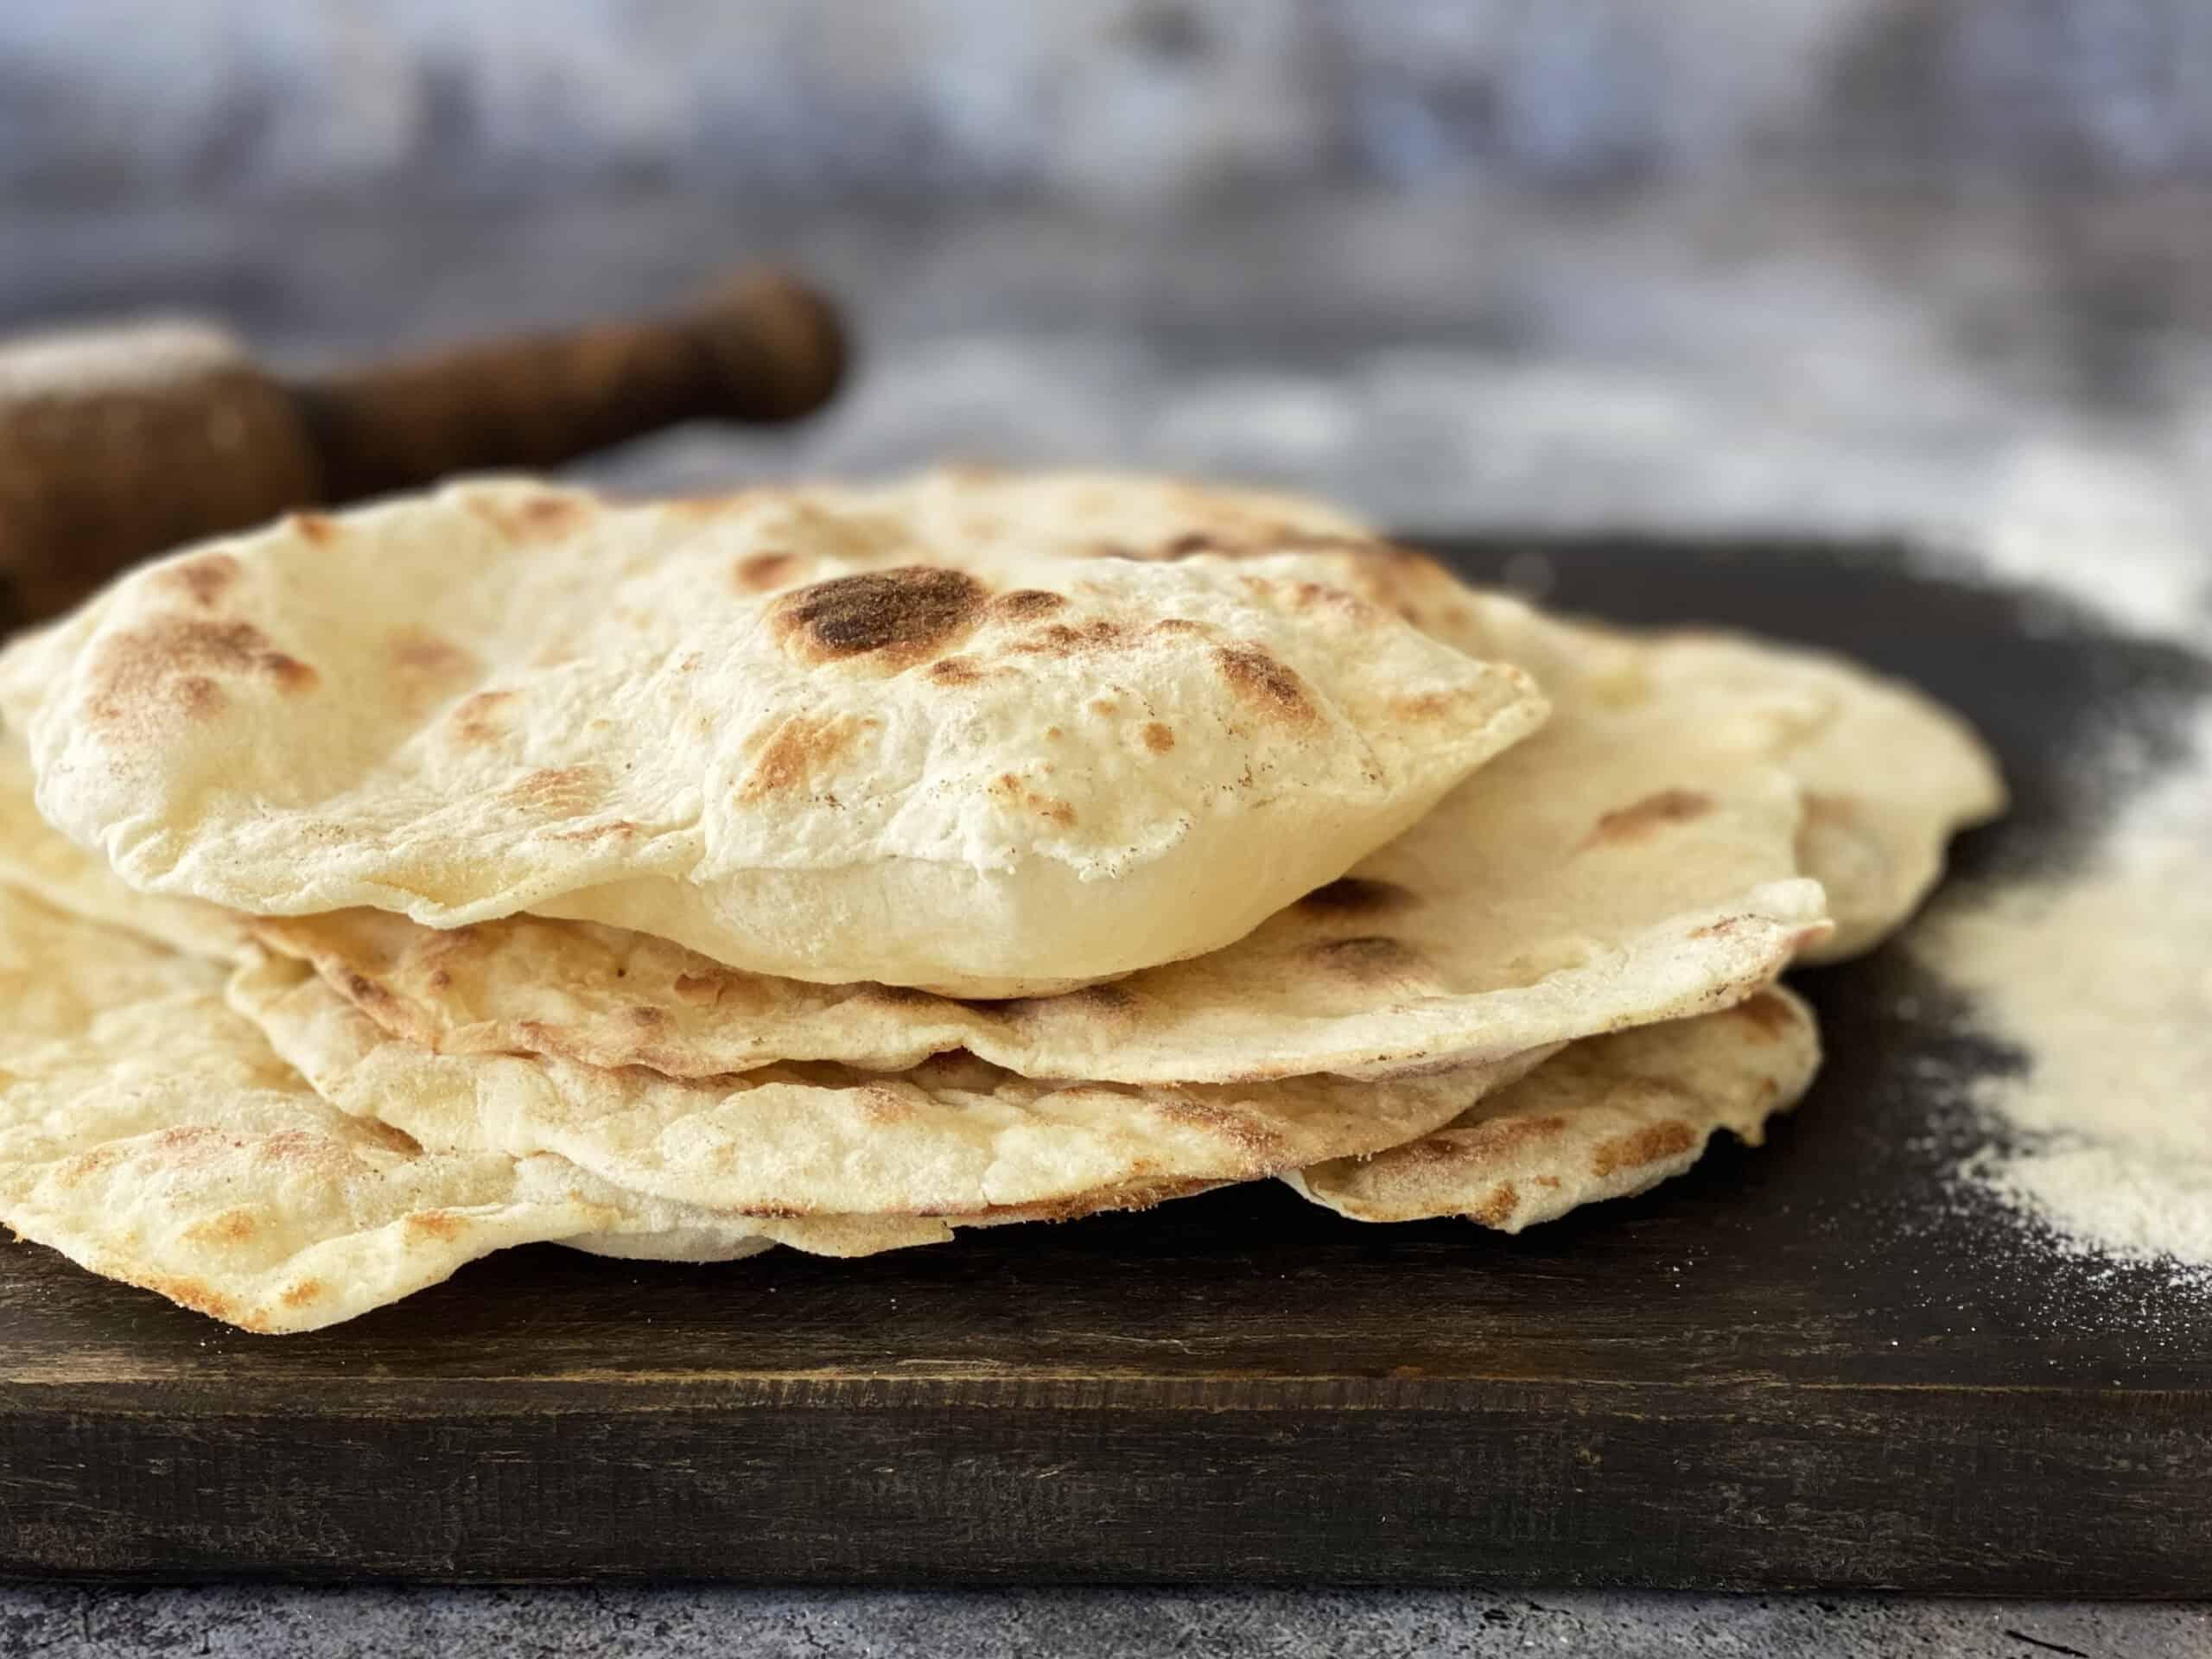 Platbrood 3 ingrediënten